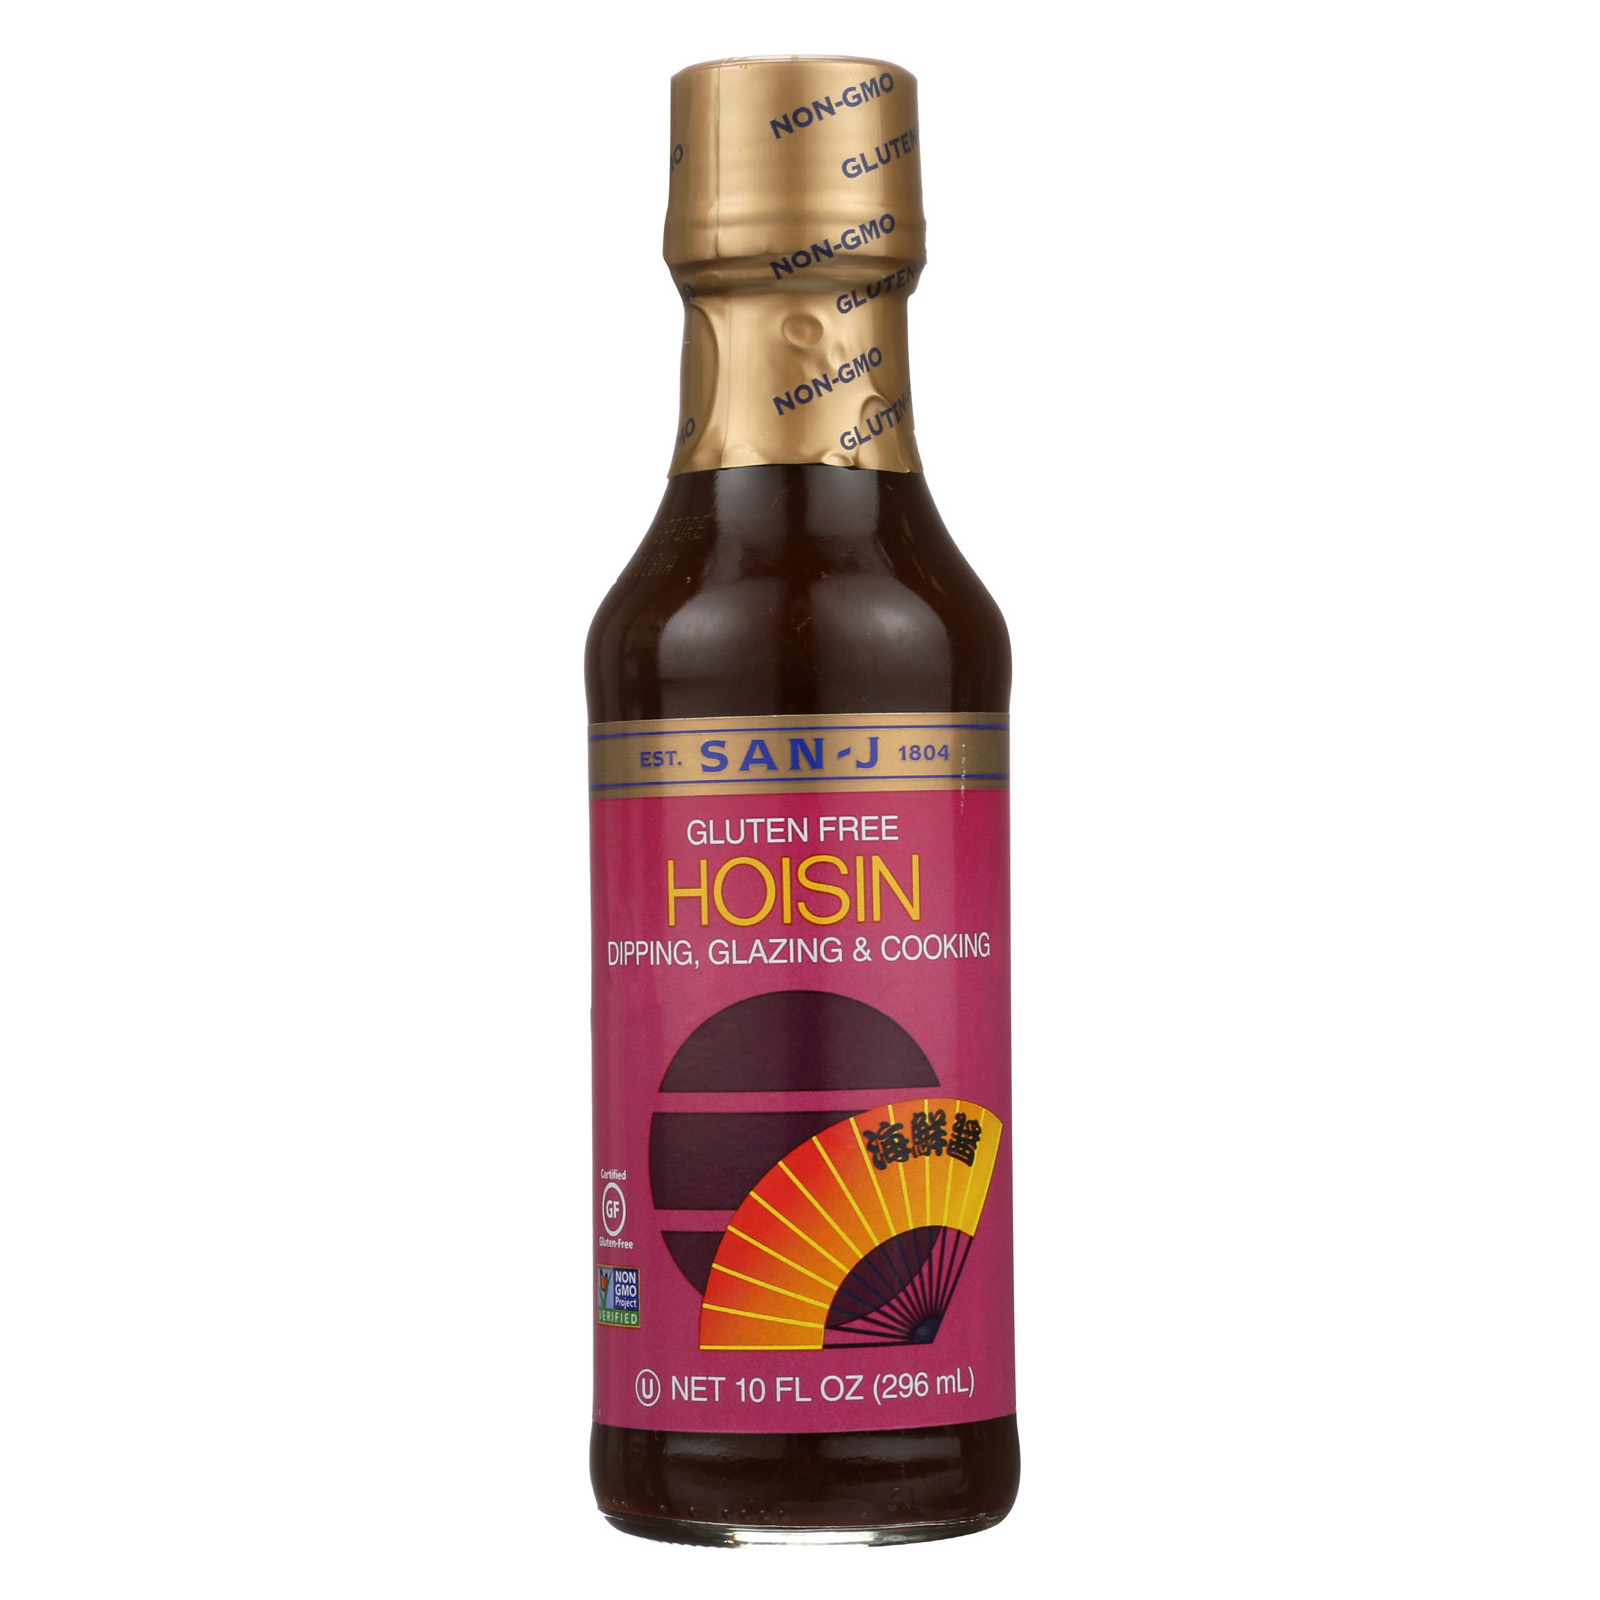 San-J Sauce - Hoisin - Gluten Free - Case of 6 - 10 fl oz